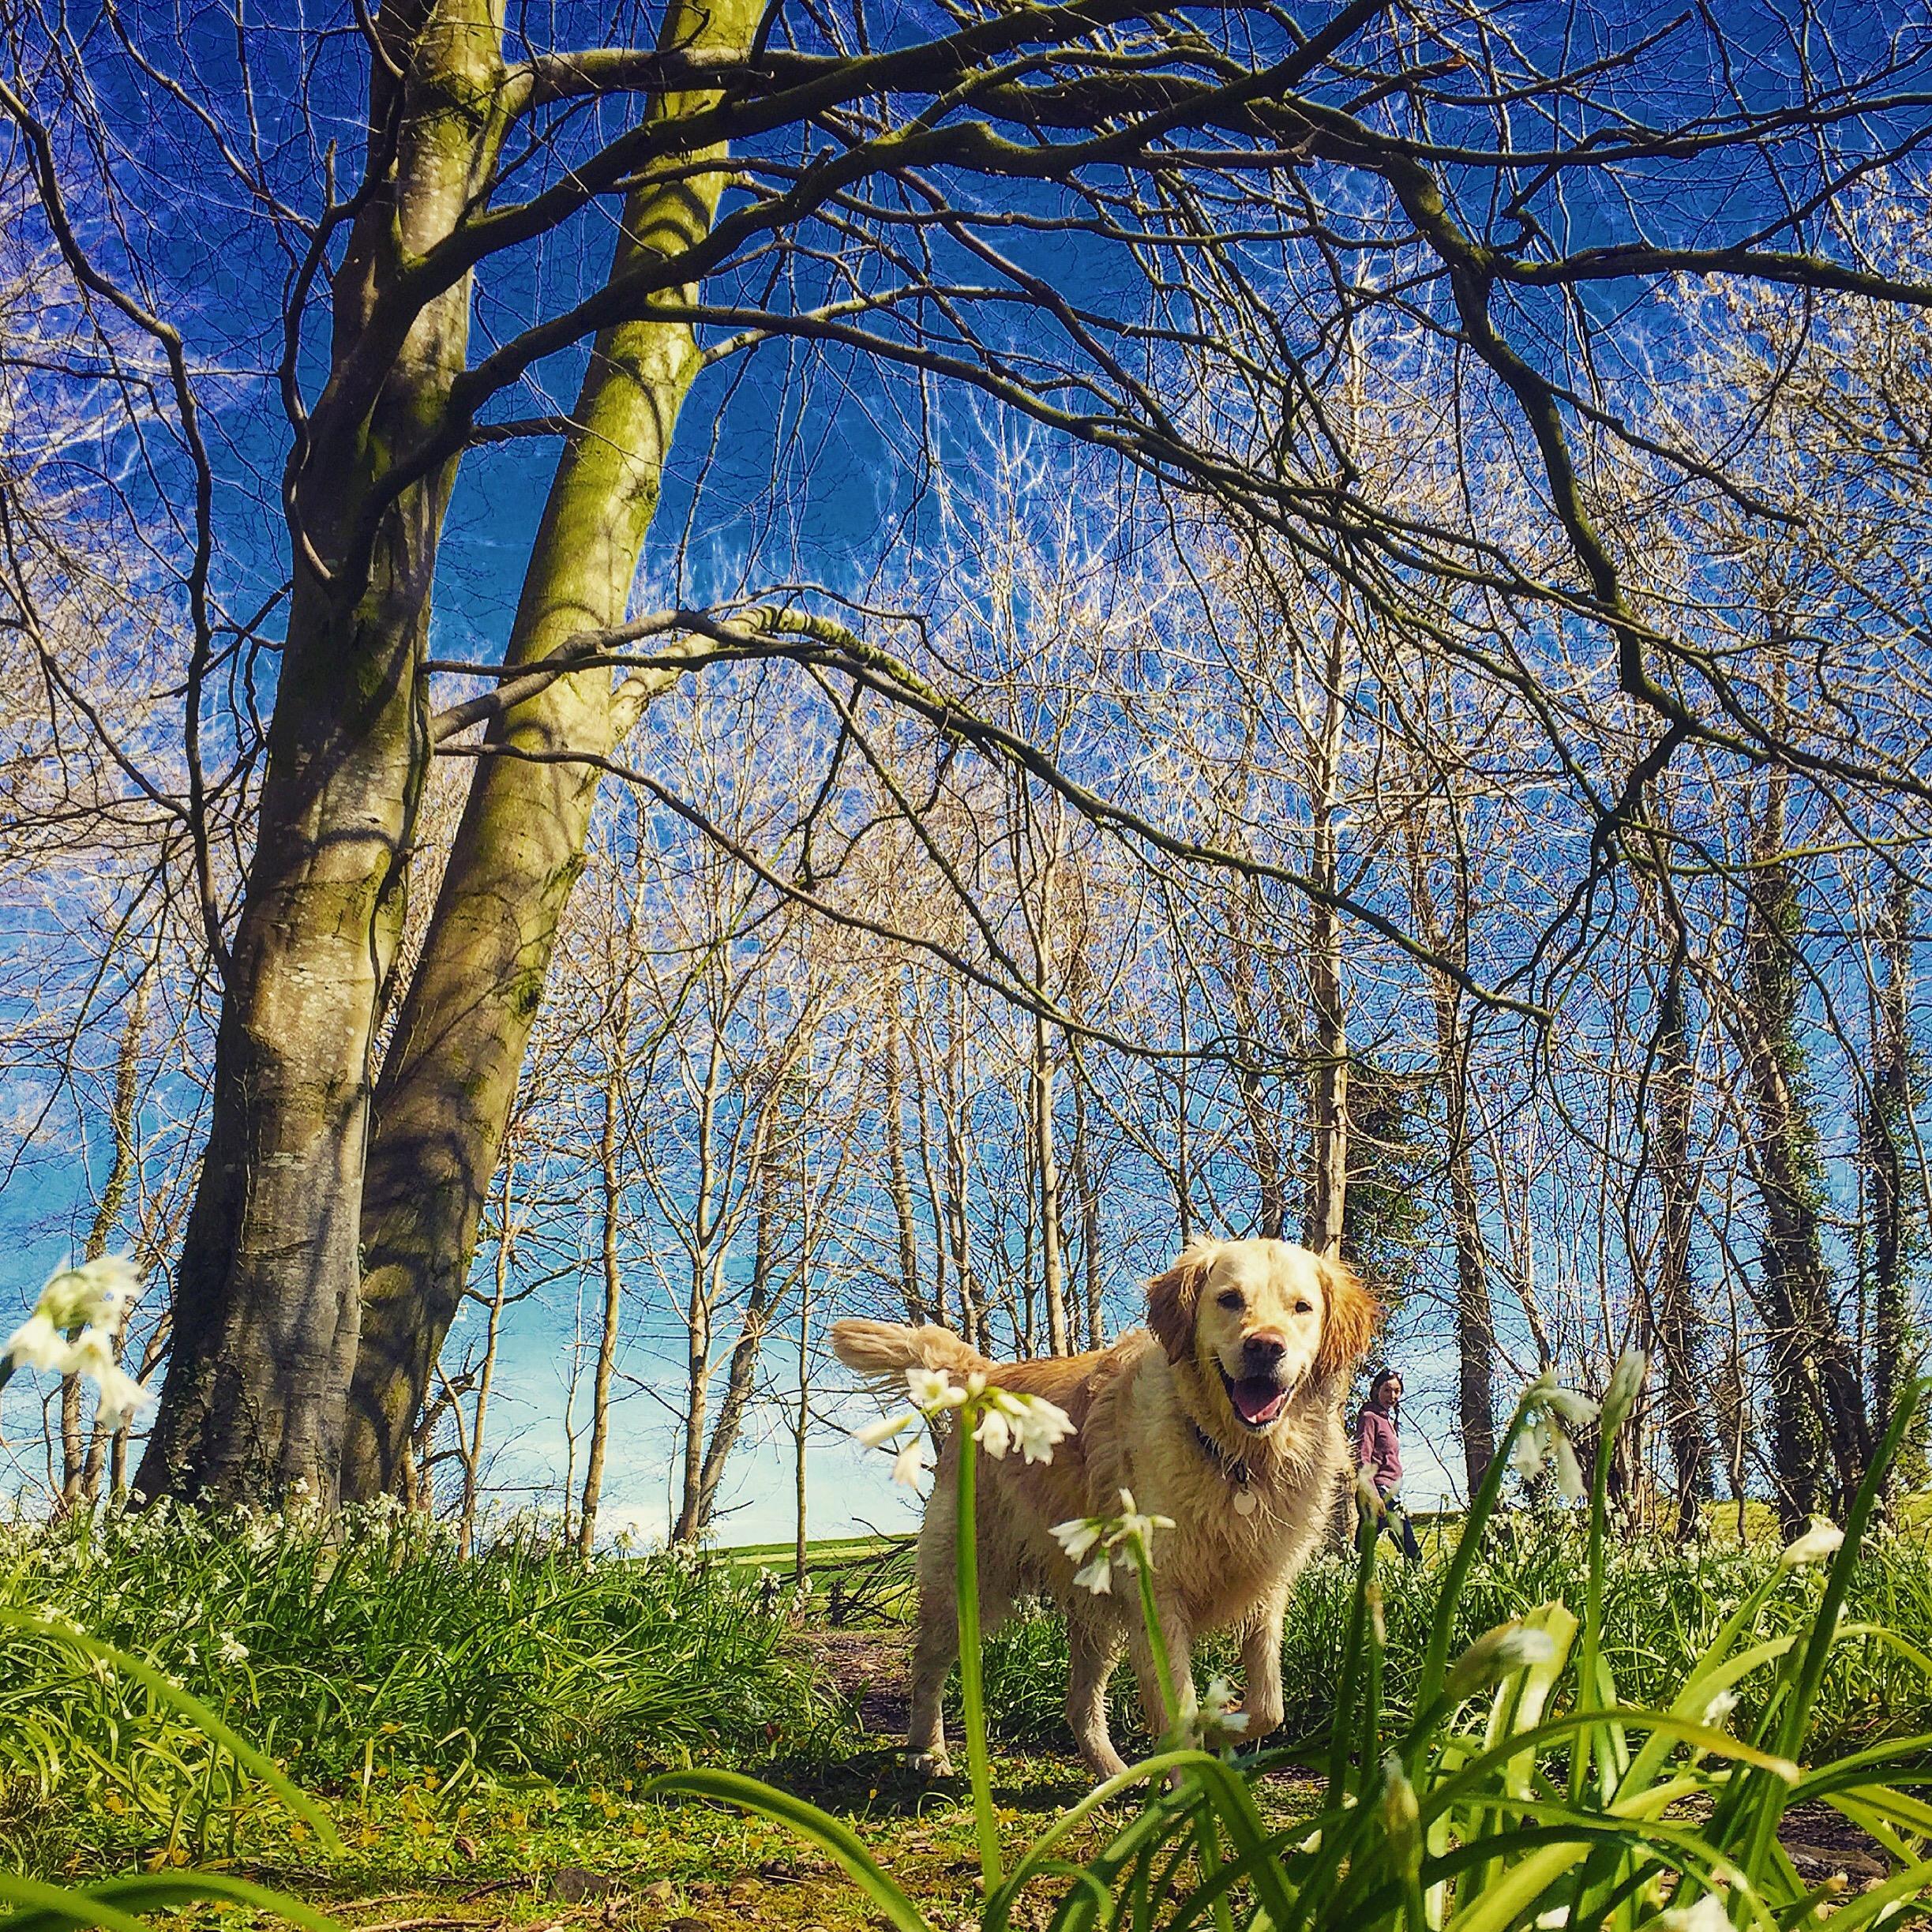 happy_dog_country_helens_bay_to_crawfordsburn_roadtrip_coast_ni_explorer_niexplorer_northern_ireland_blog.jpg